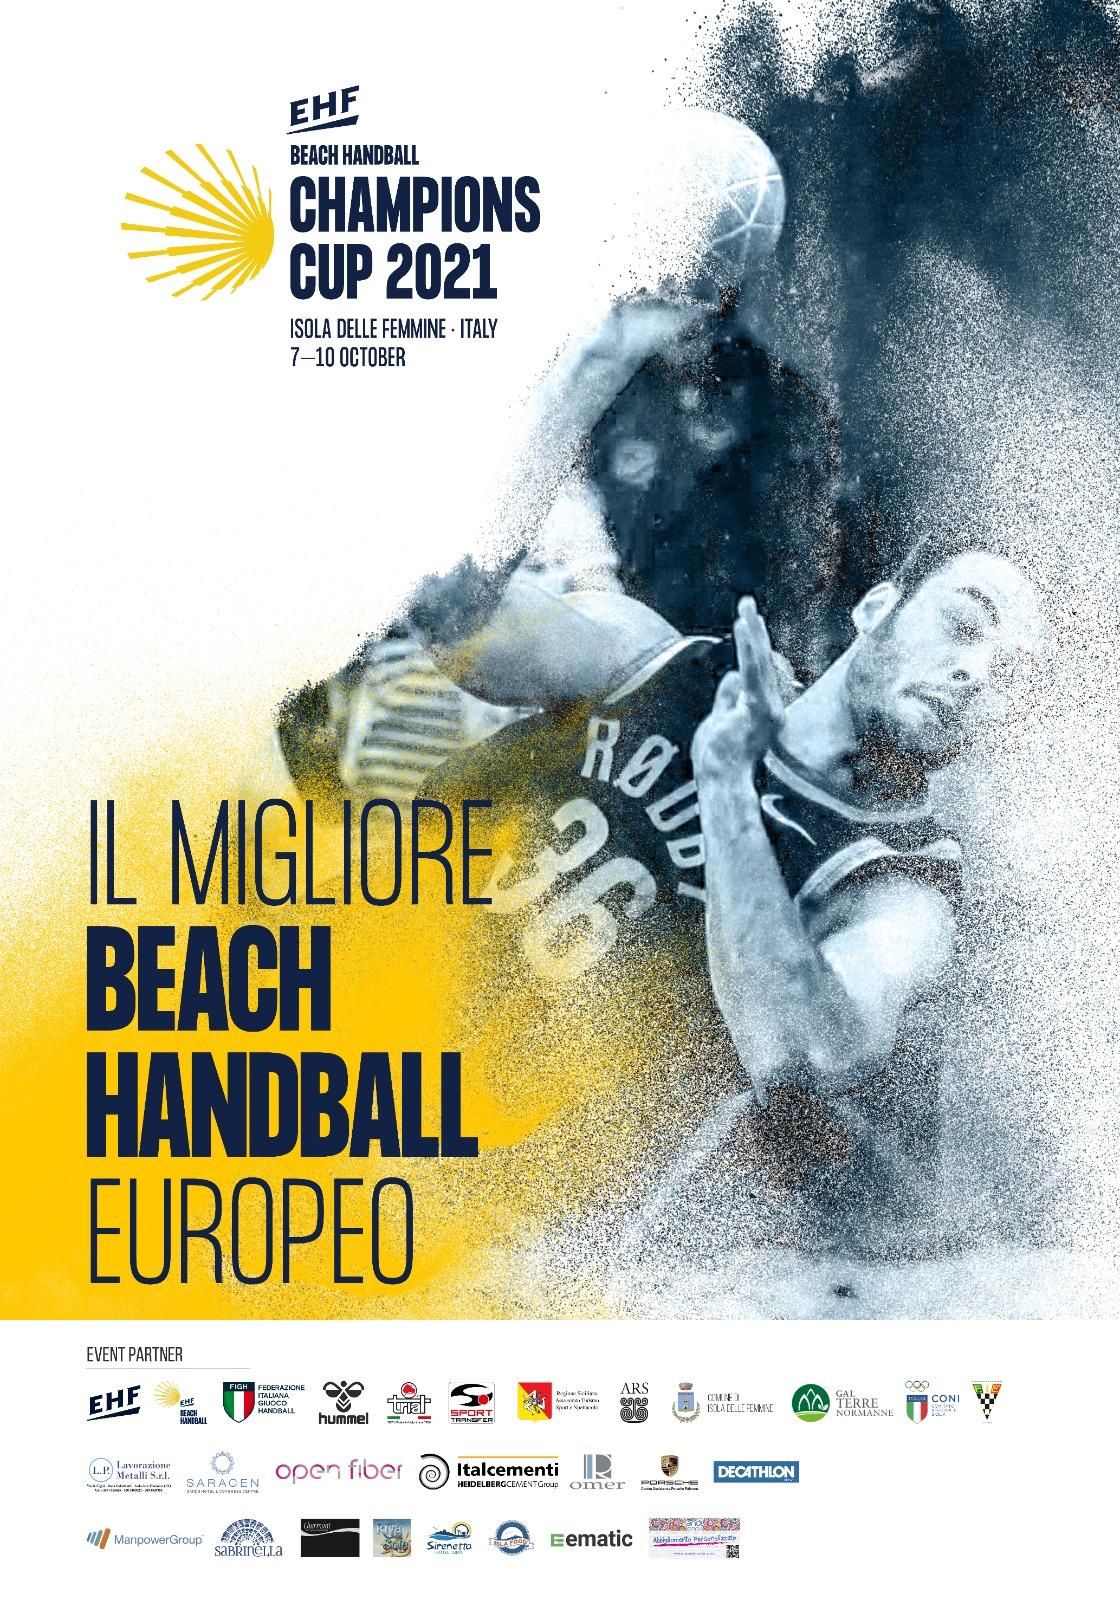 Al via la Champions Cup 2021 di Handball beach